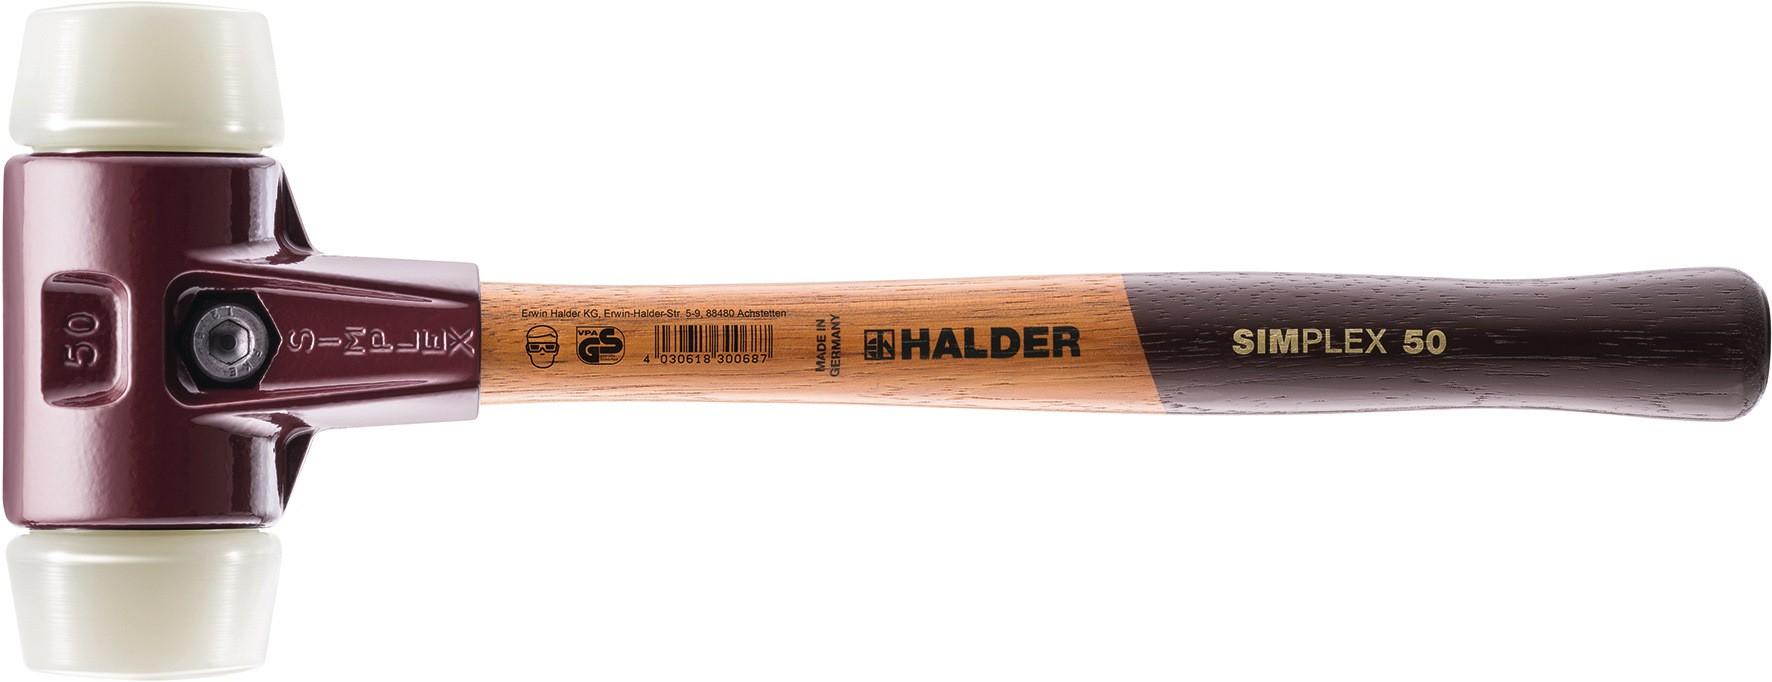 HALDER 3208050 Schonhammerkopf SIMPLEX Kopf-D 50 mm Nylon weiß hart